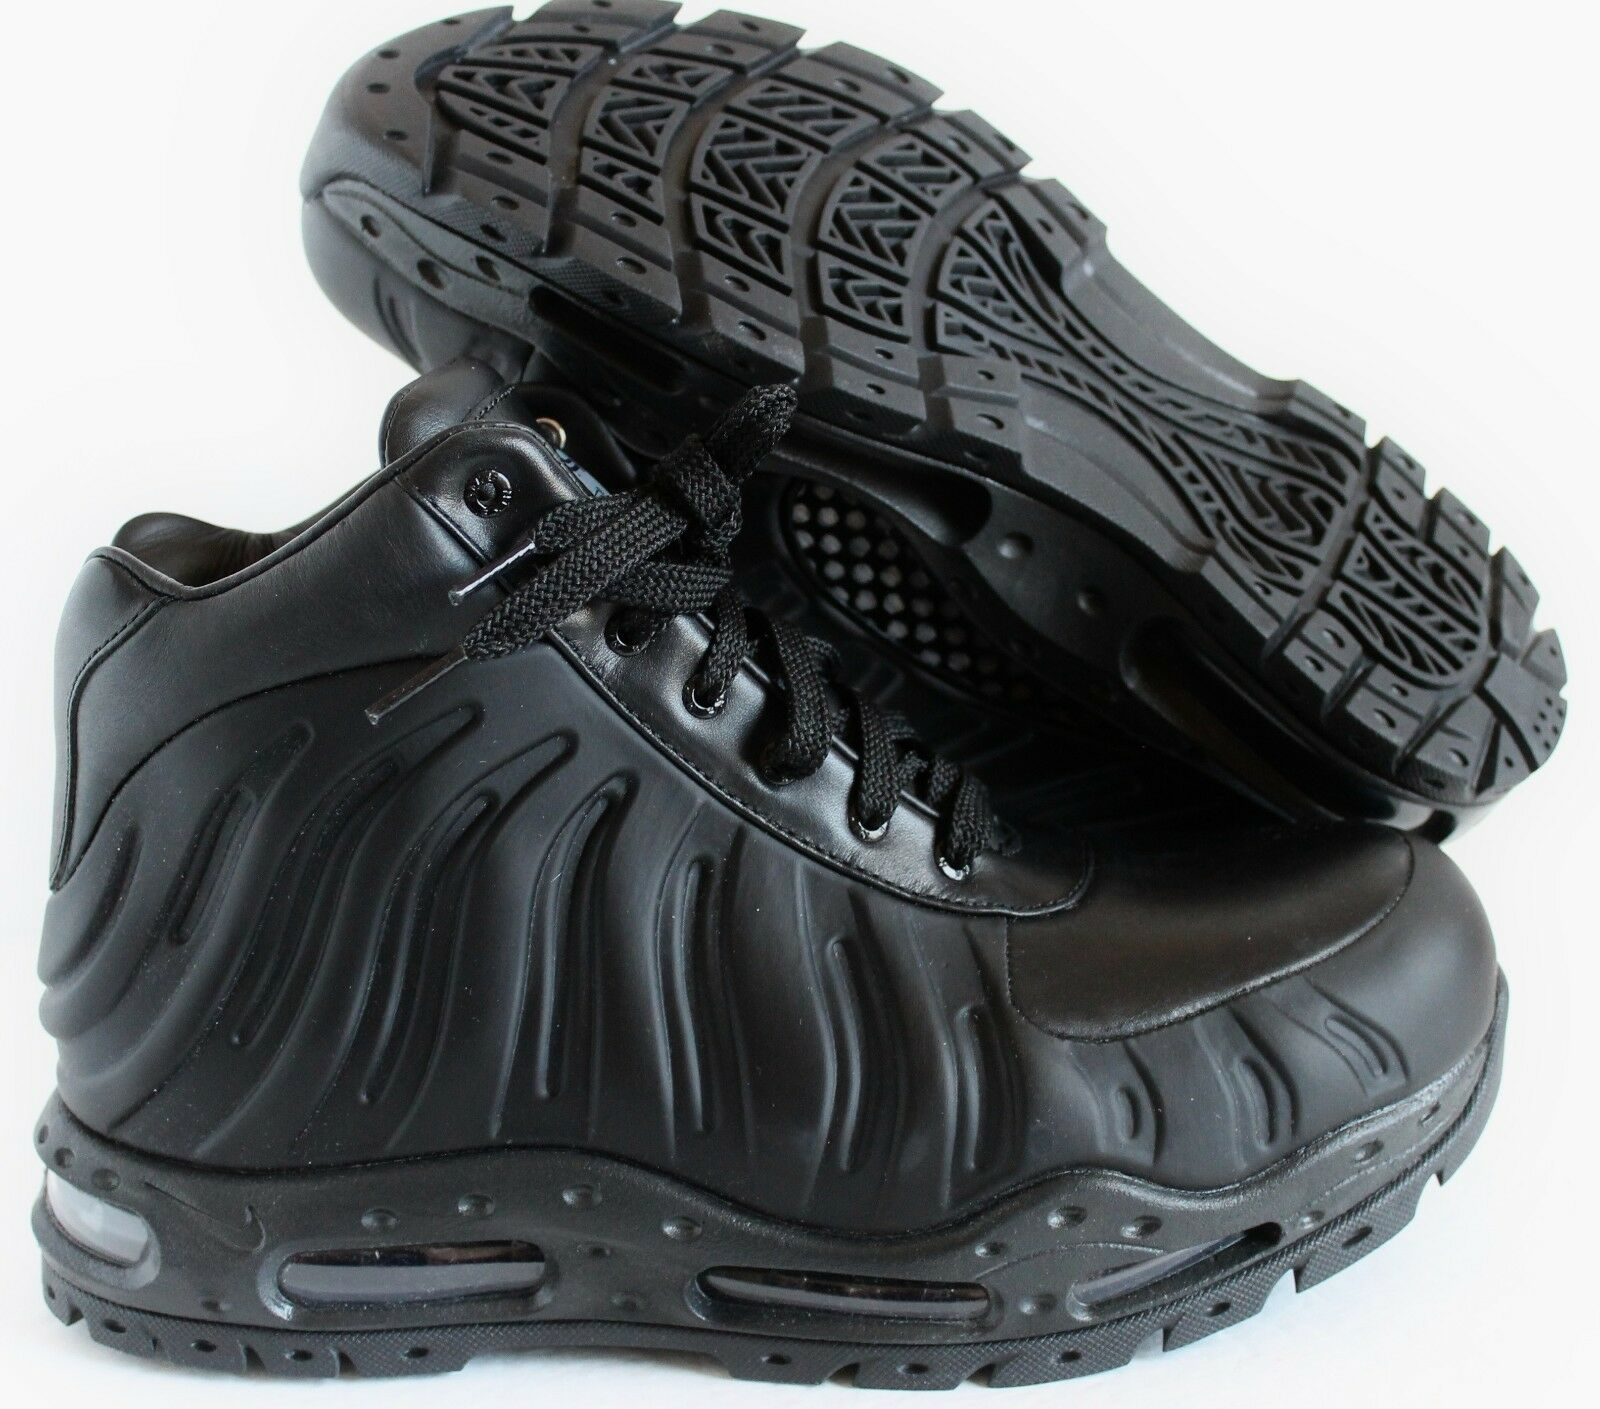 NIKE AIR MAX FOAMDOME FOAMPOSITE BOOTS BLACK-BLACK Price reduction Seasonal clearance sale